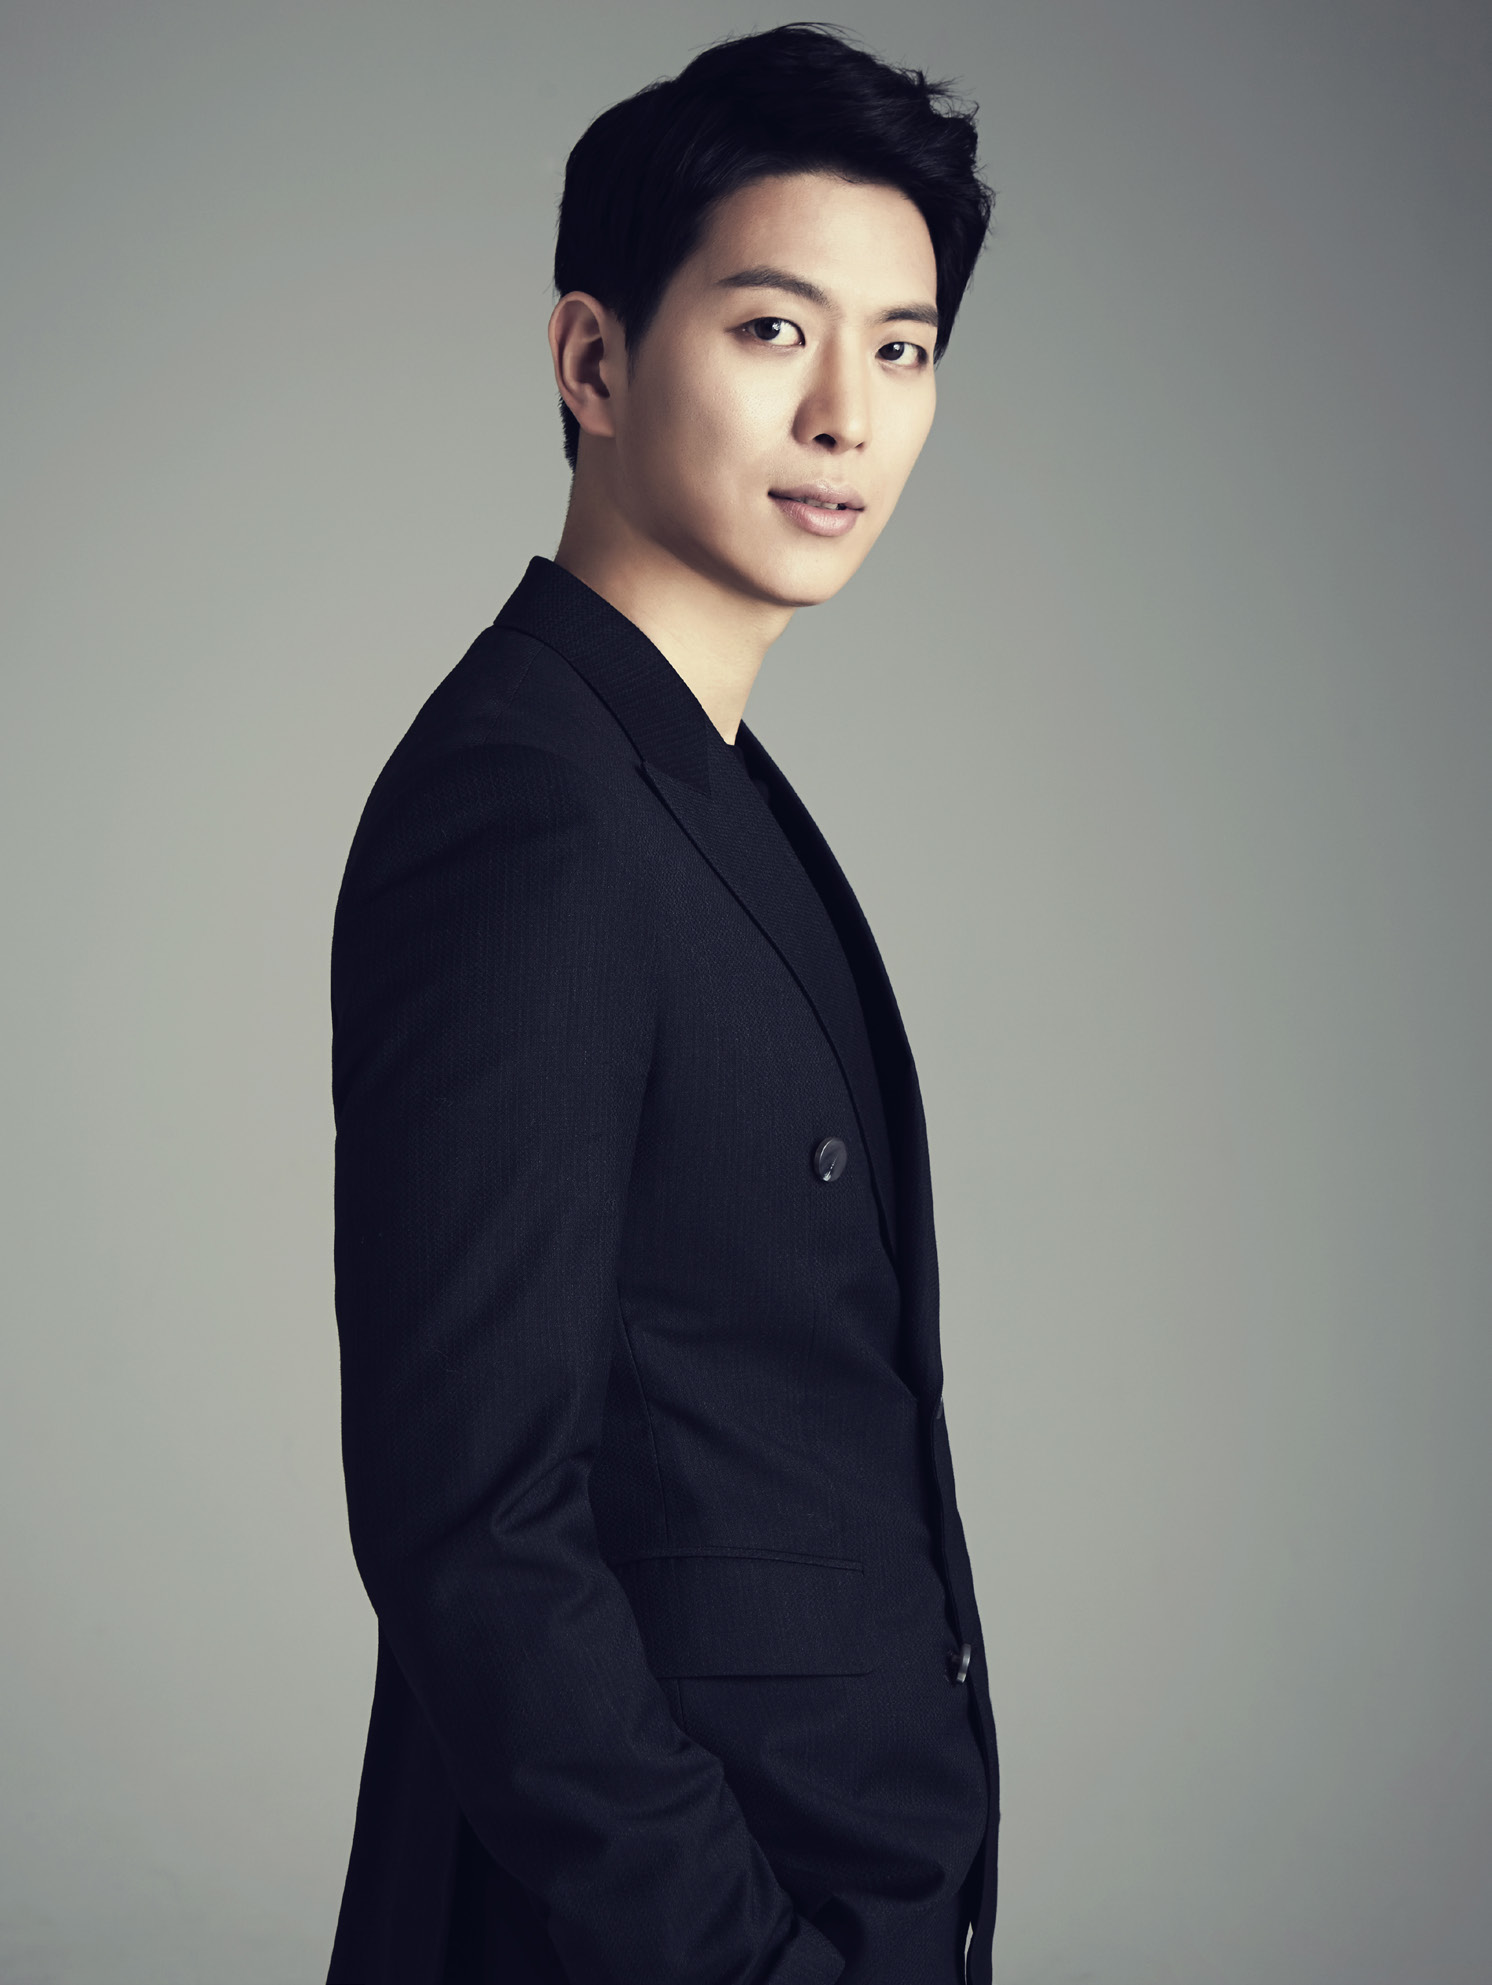 Seo Dong Gun